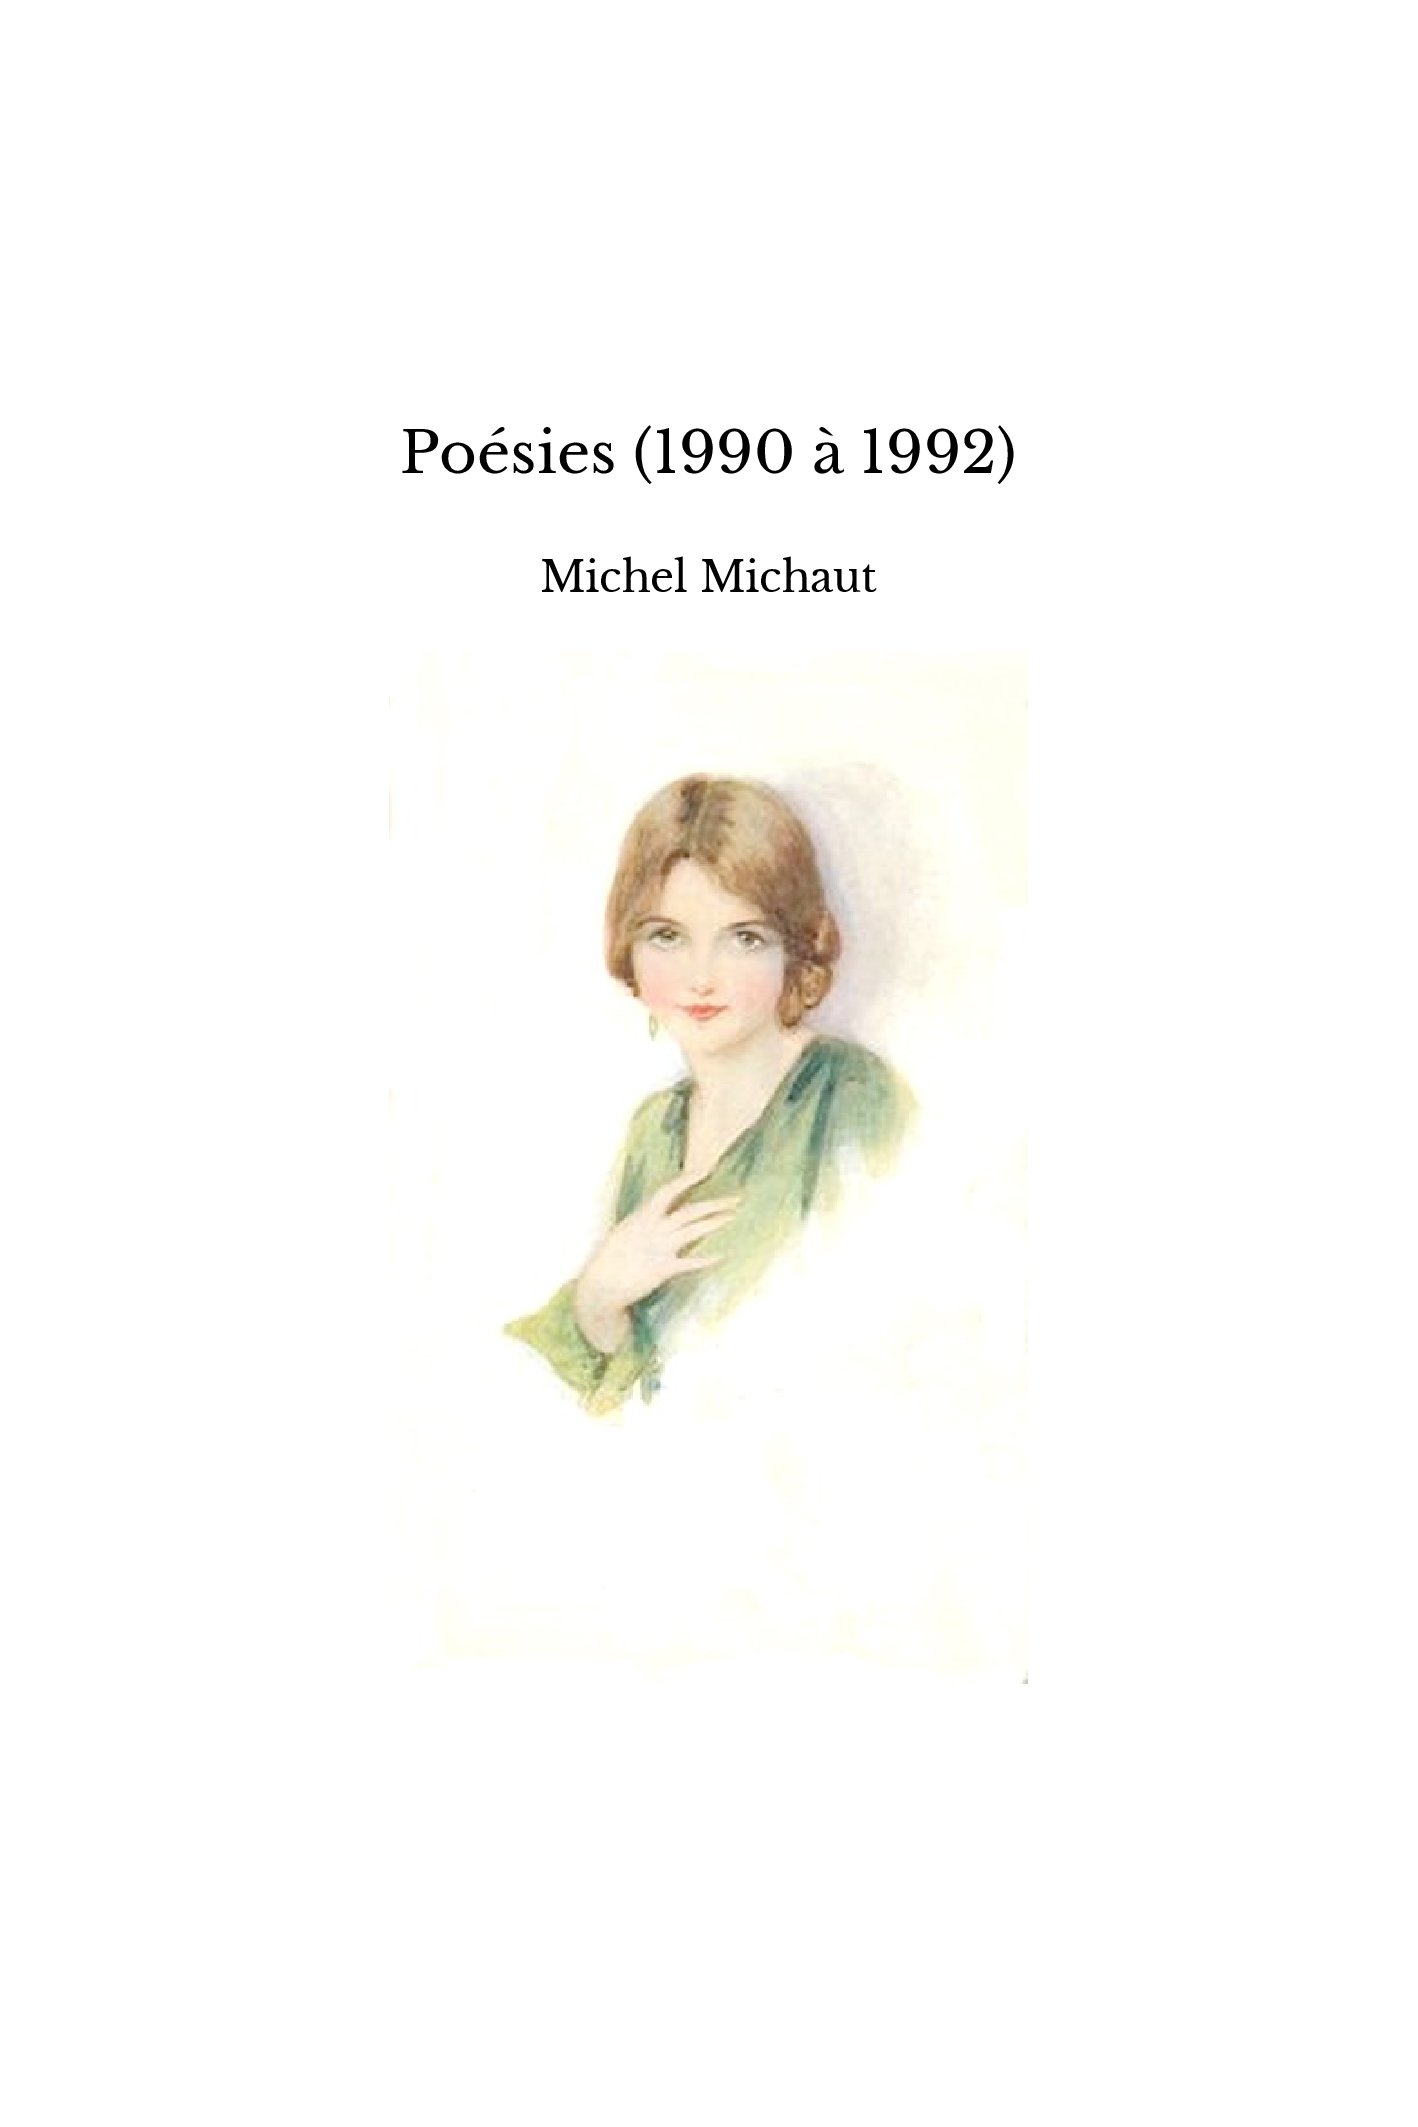 Poésies (1990 à 1992)